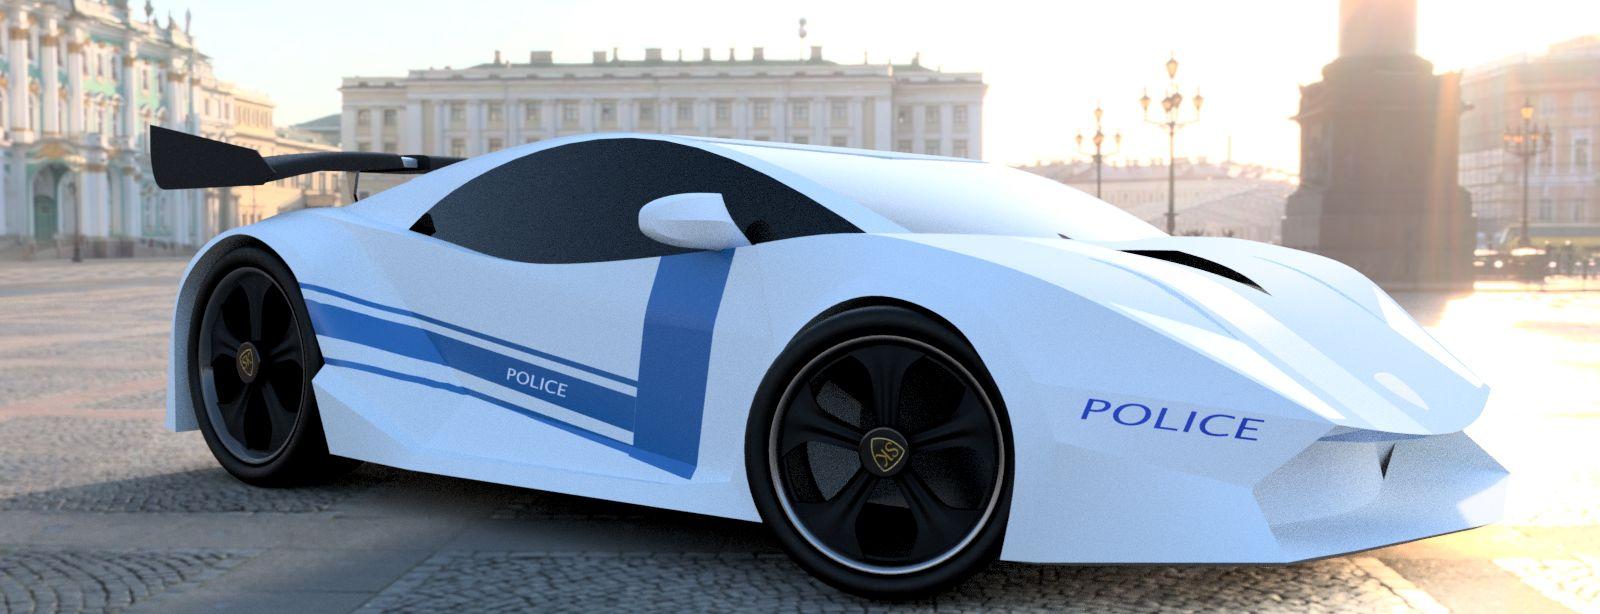 hight resolution of concept car 2 v24 3500 3500